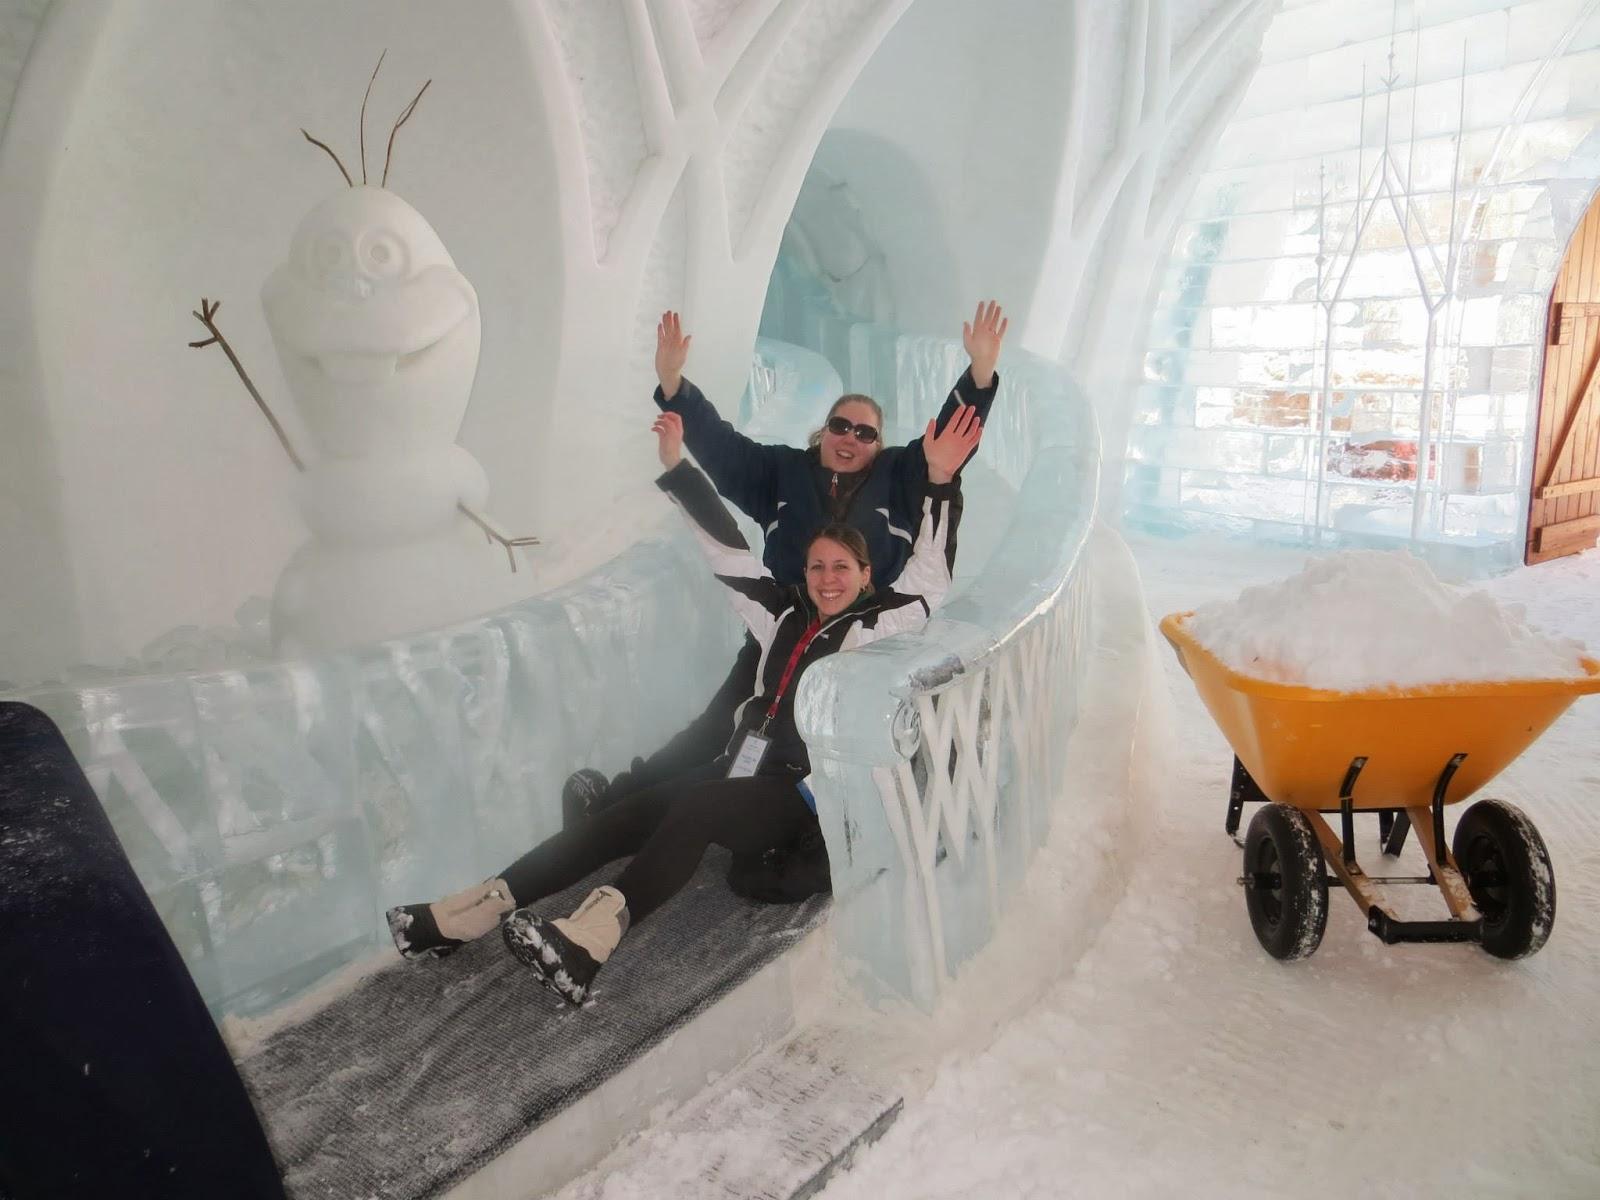 hotel de glace ice slide